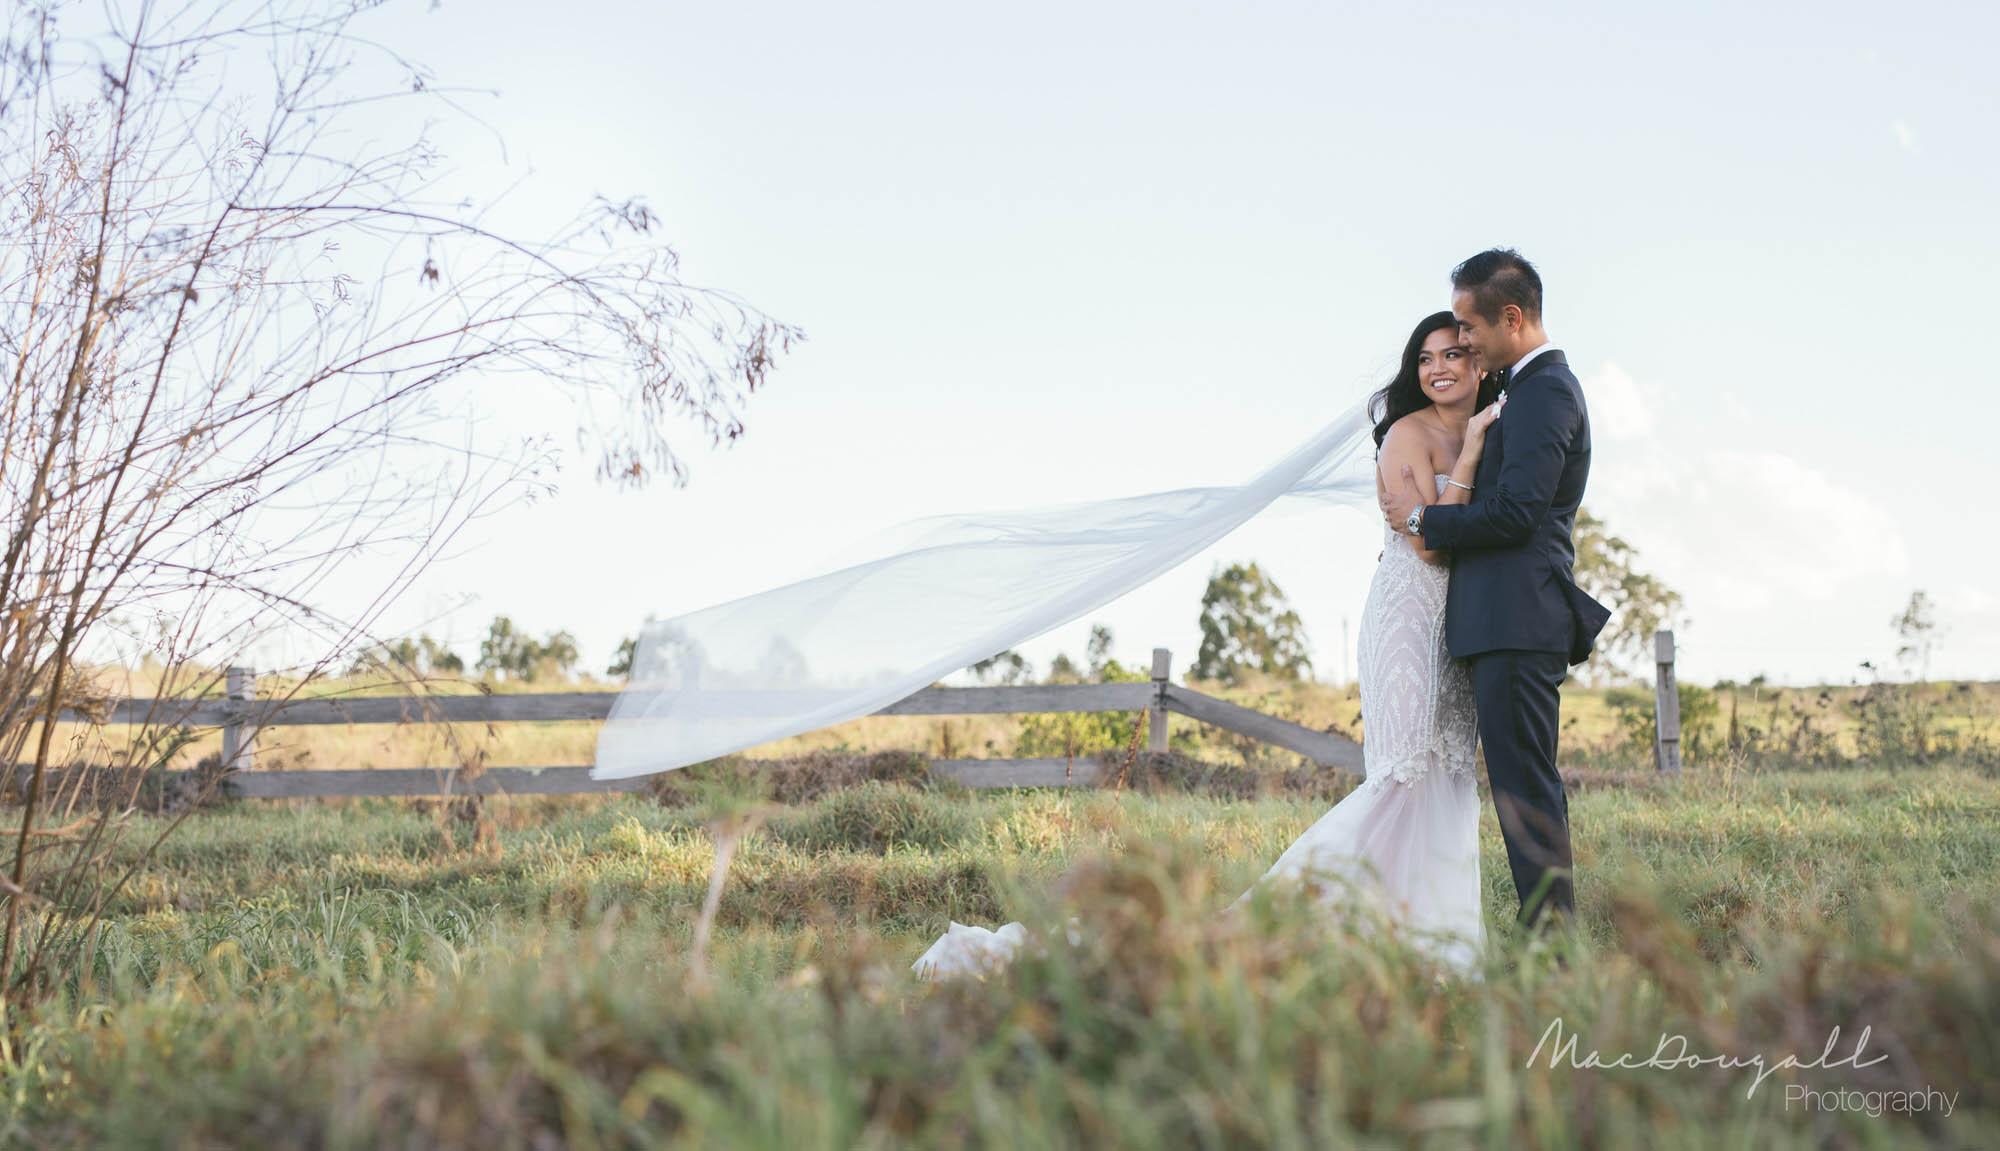 MacDougall-Photography-Sydney-Wedding-Photographers-25.jpg